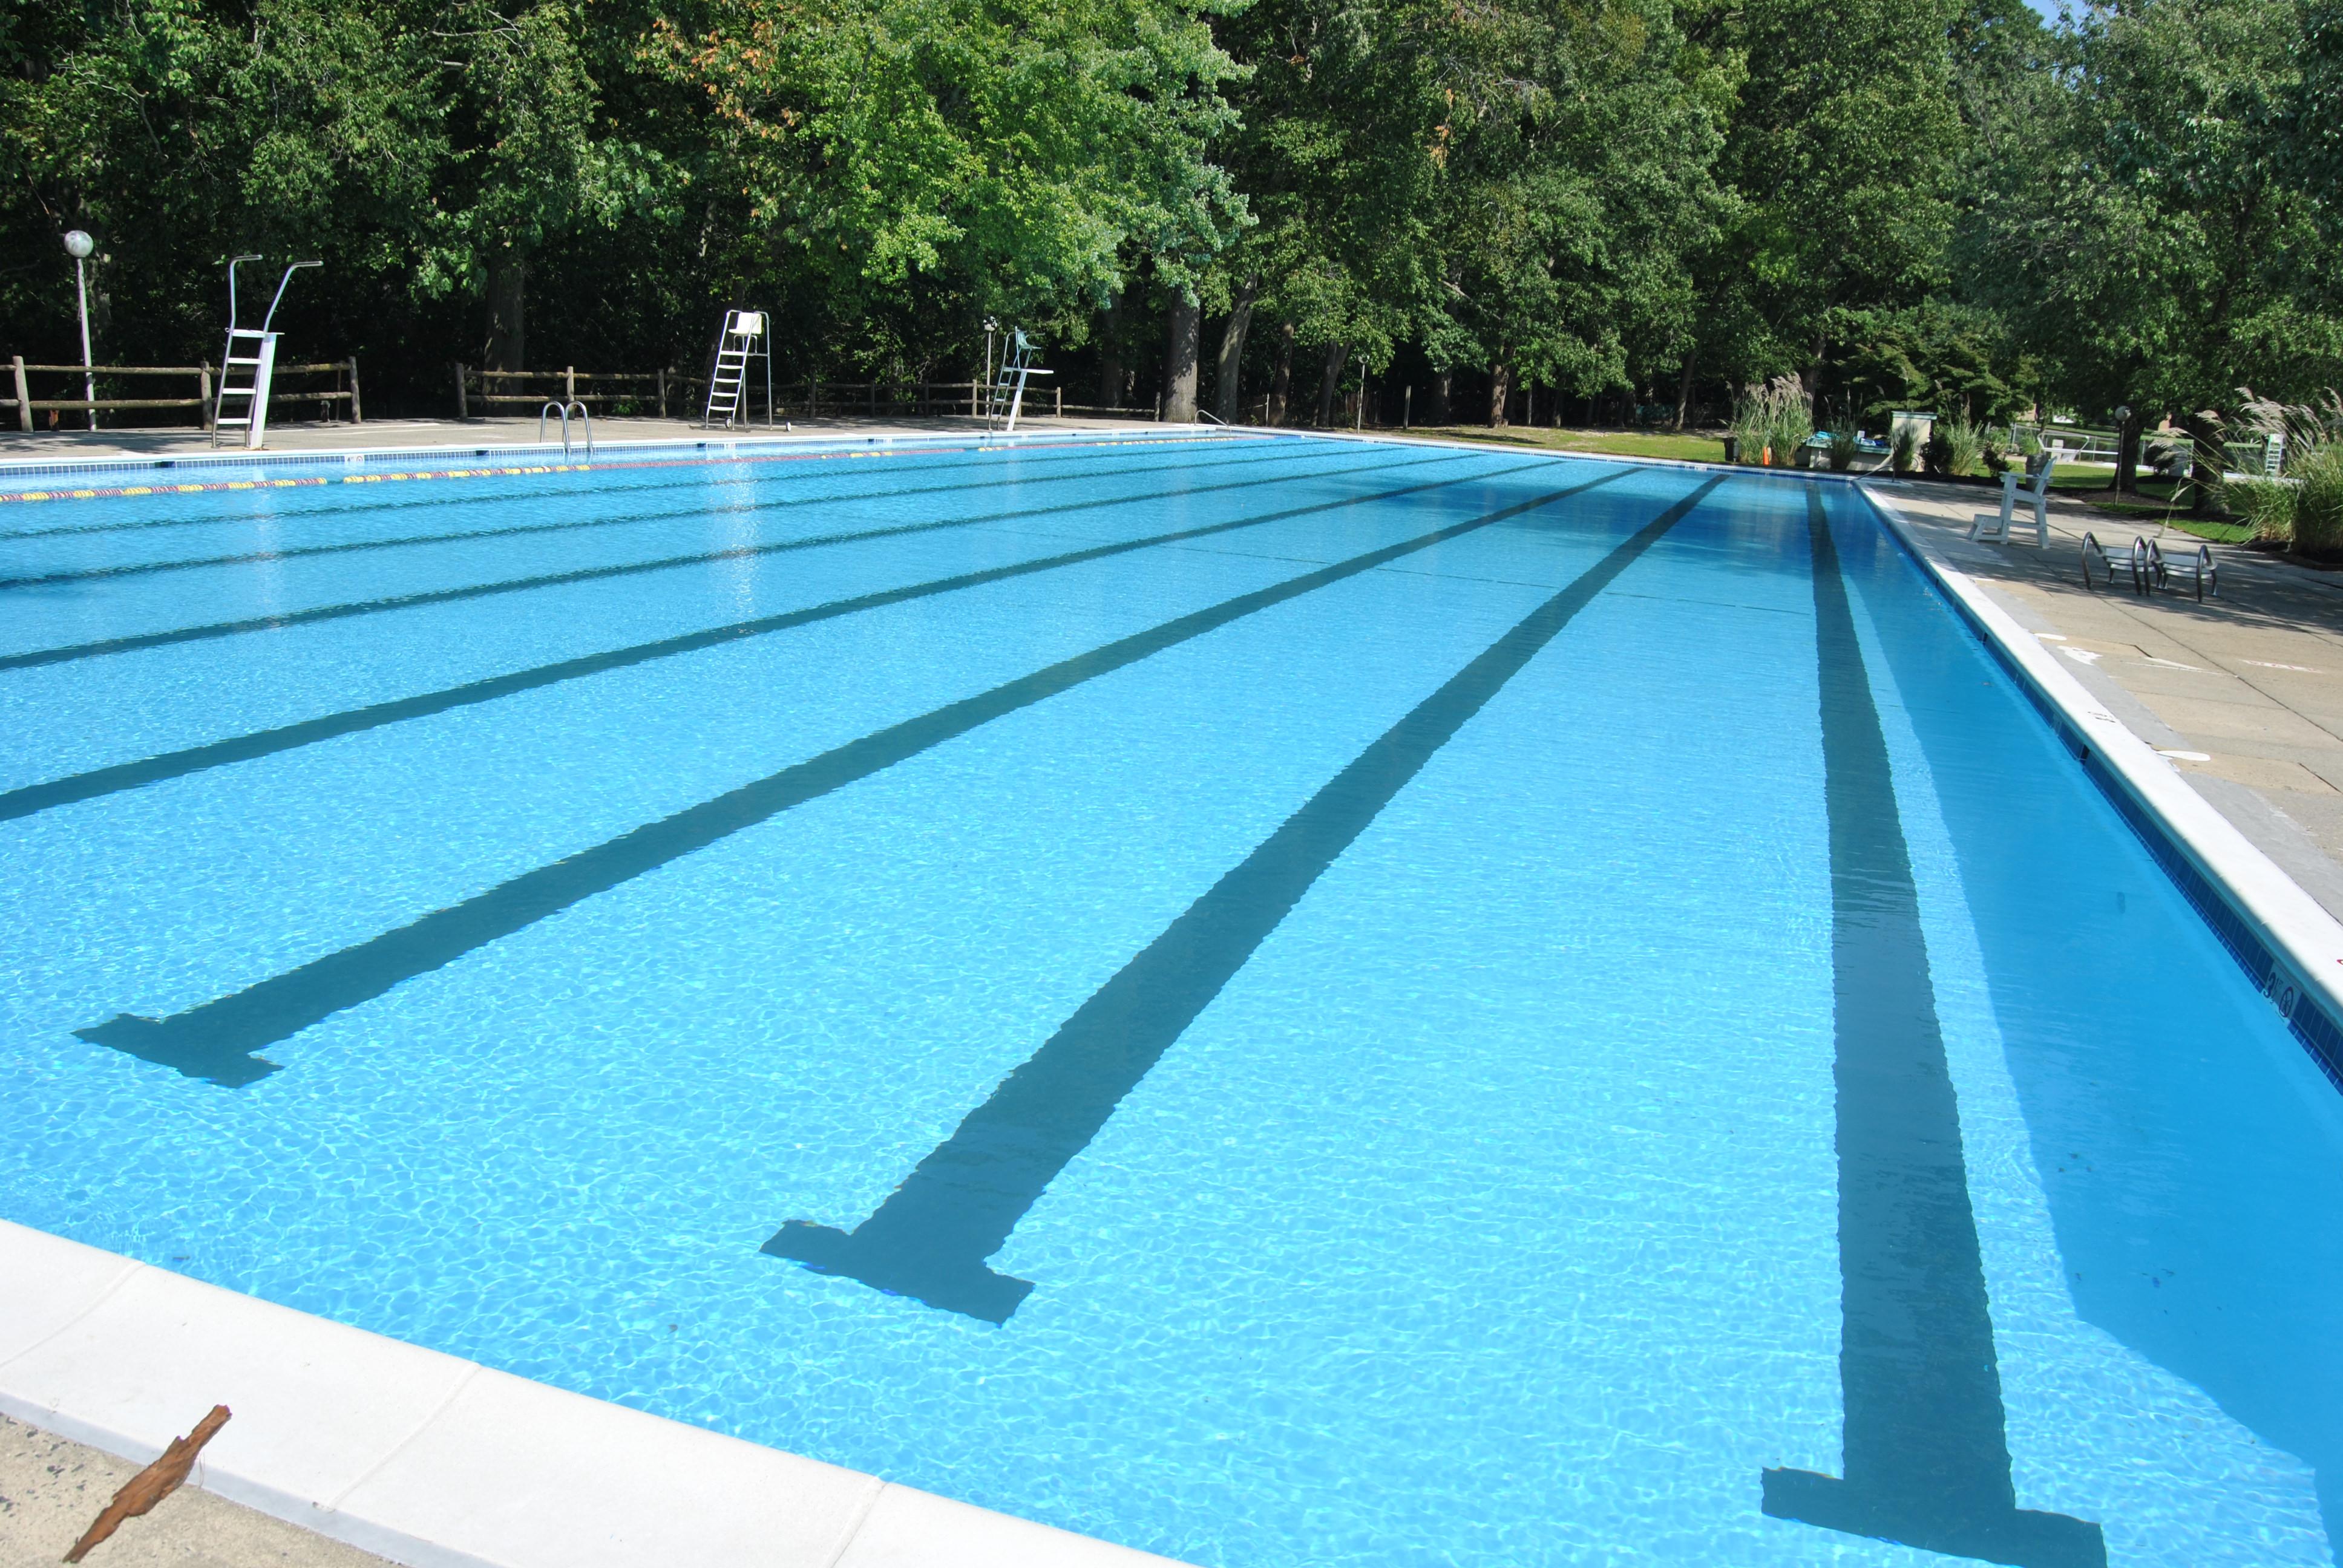 Ramblewood Swim Club image 15